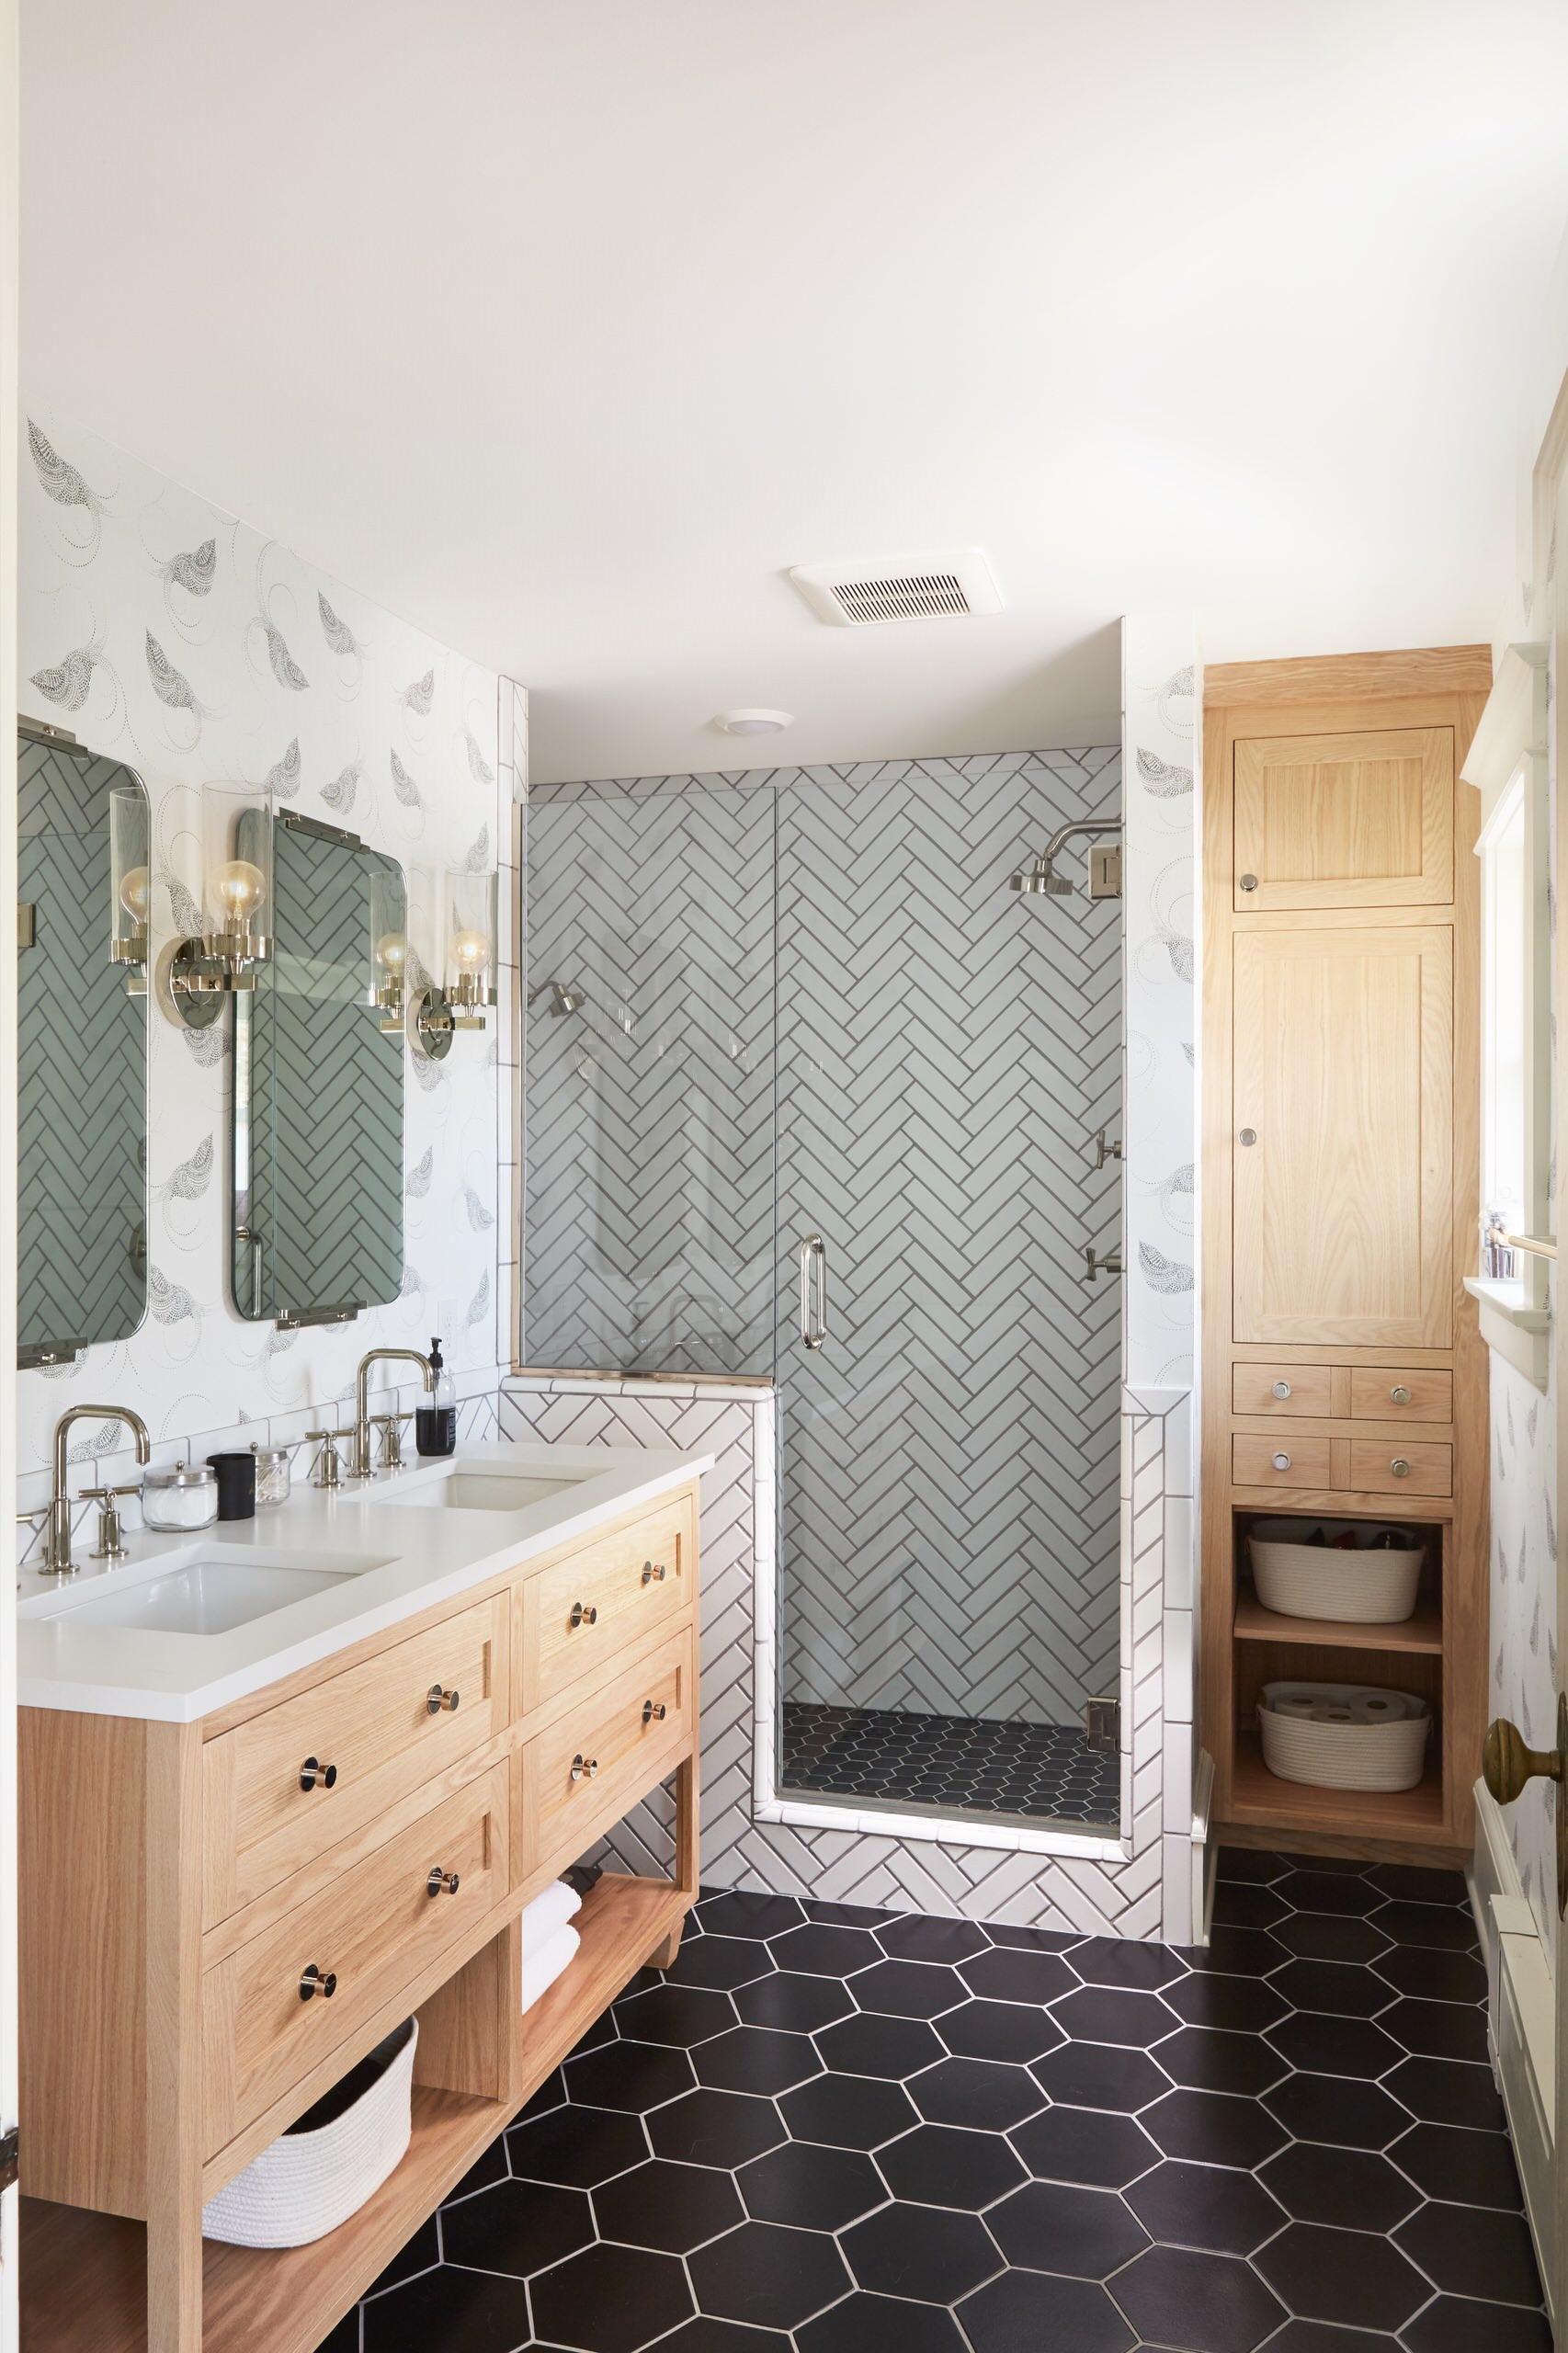 75 Beautiful Wallpaper Bathroom Pictures Ideas April 2021 Houzz